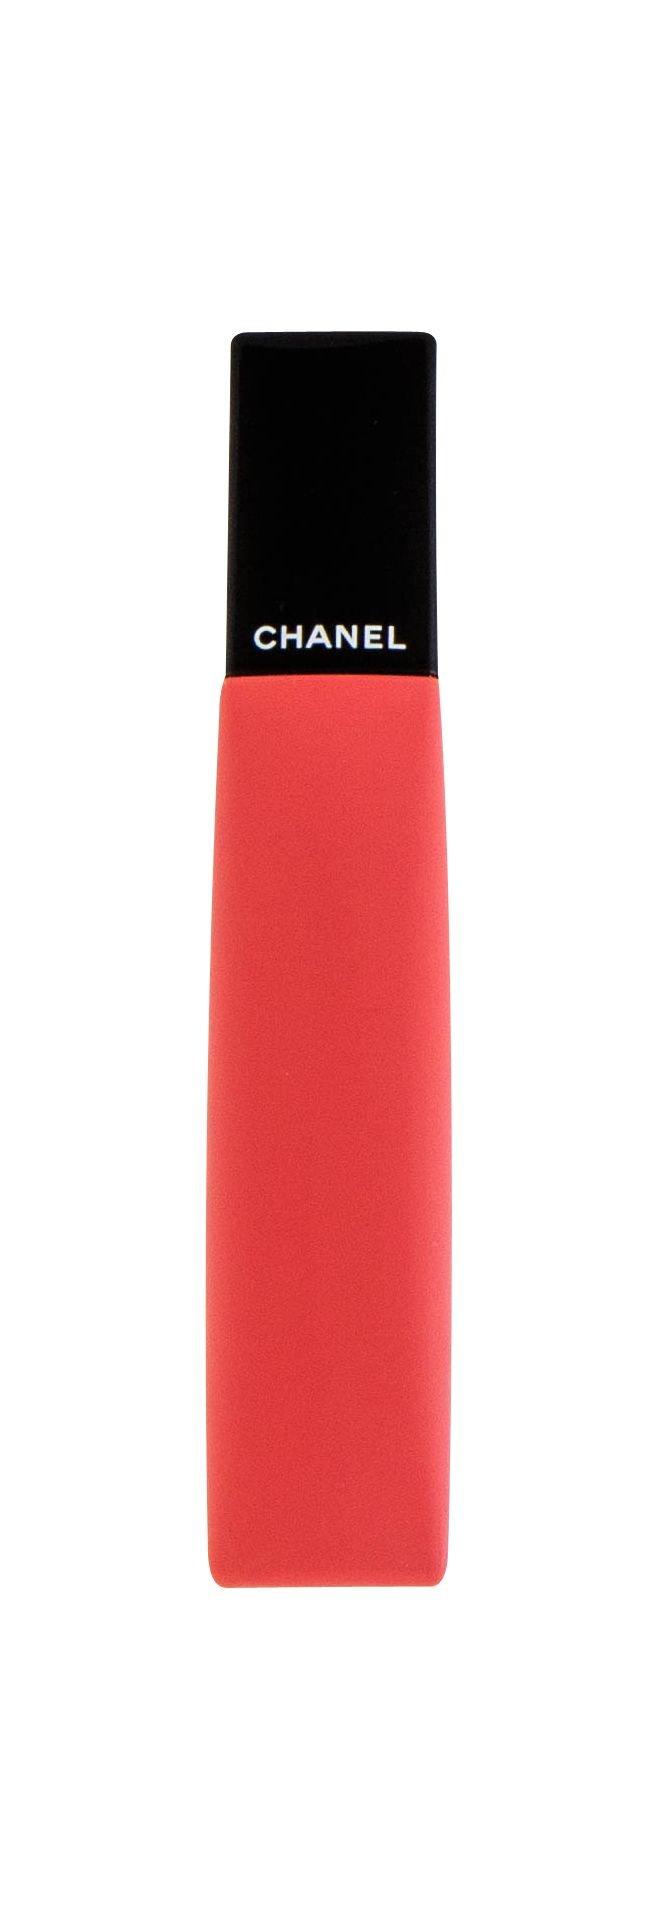 Chanel Rouge Allure Lipstick 9ml 952 Evocation